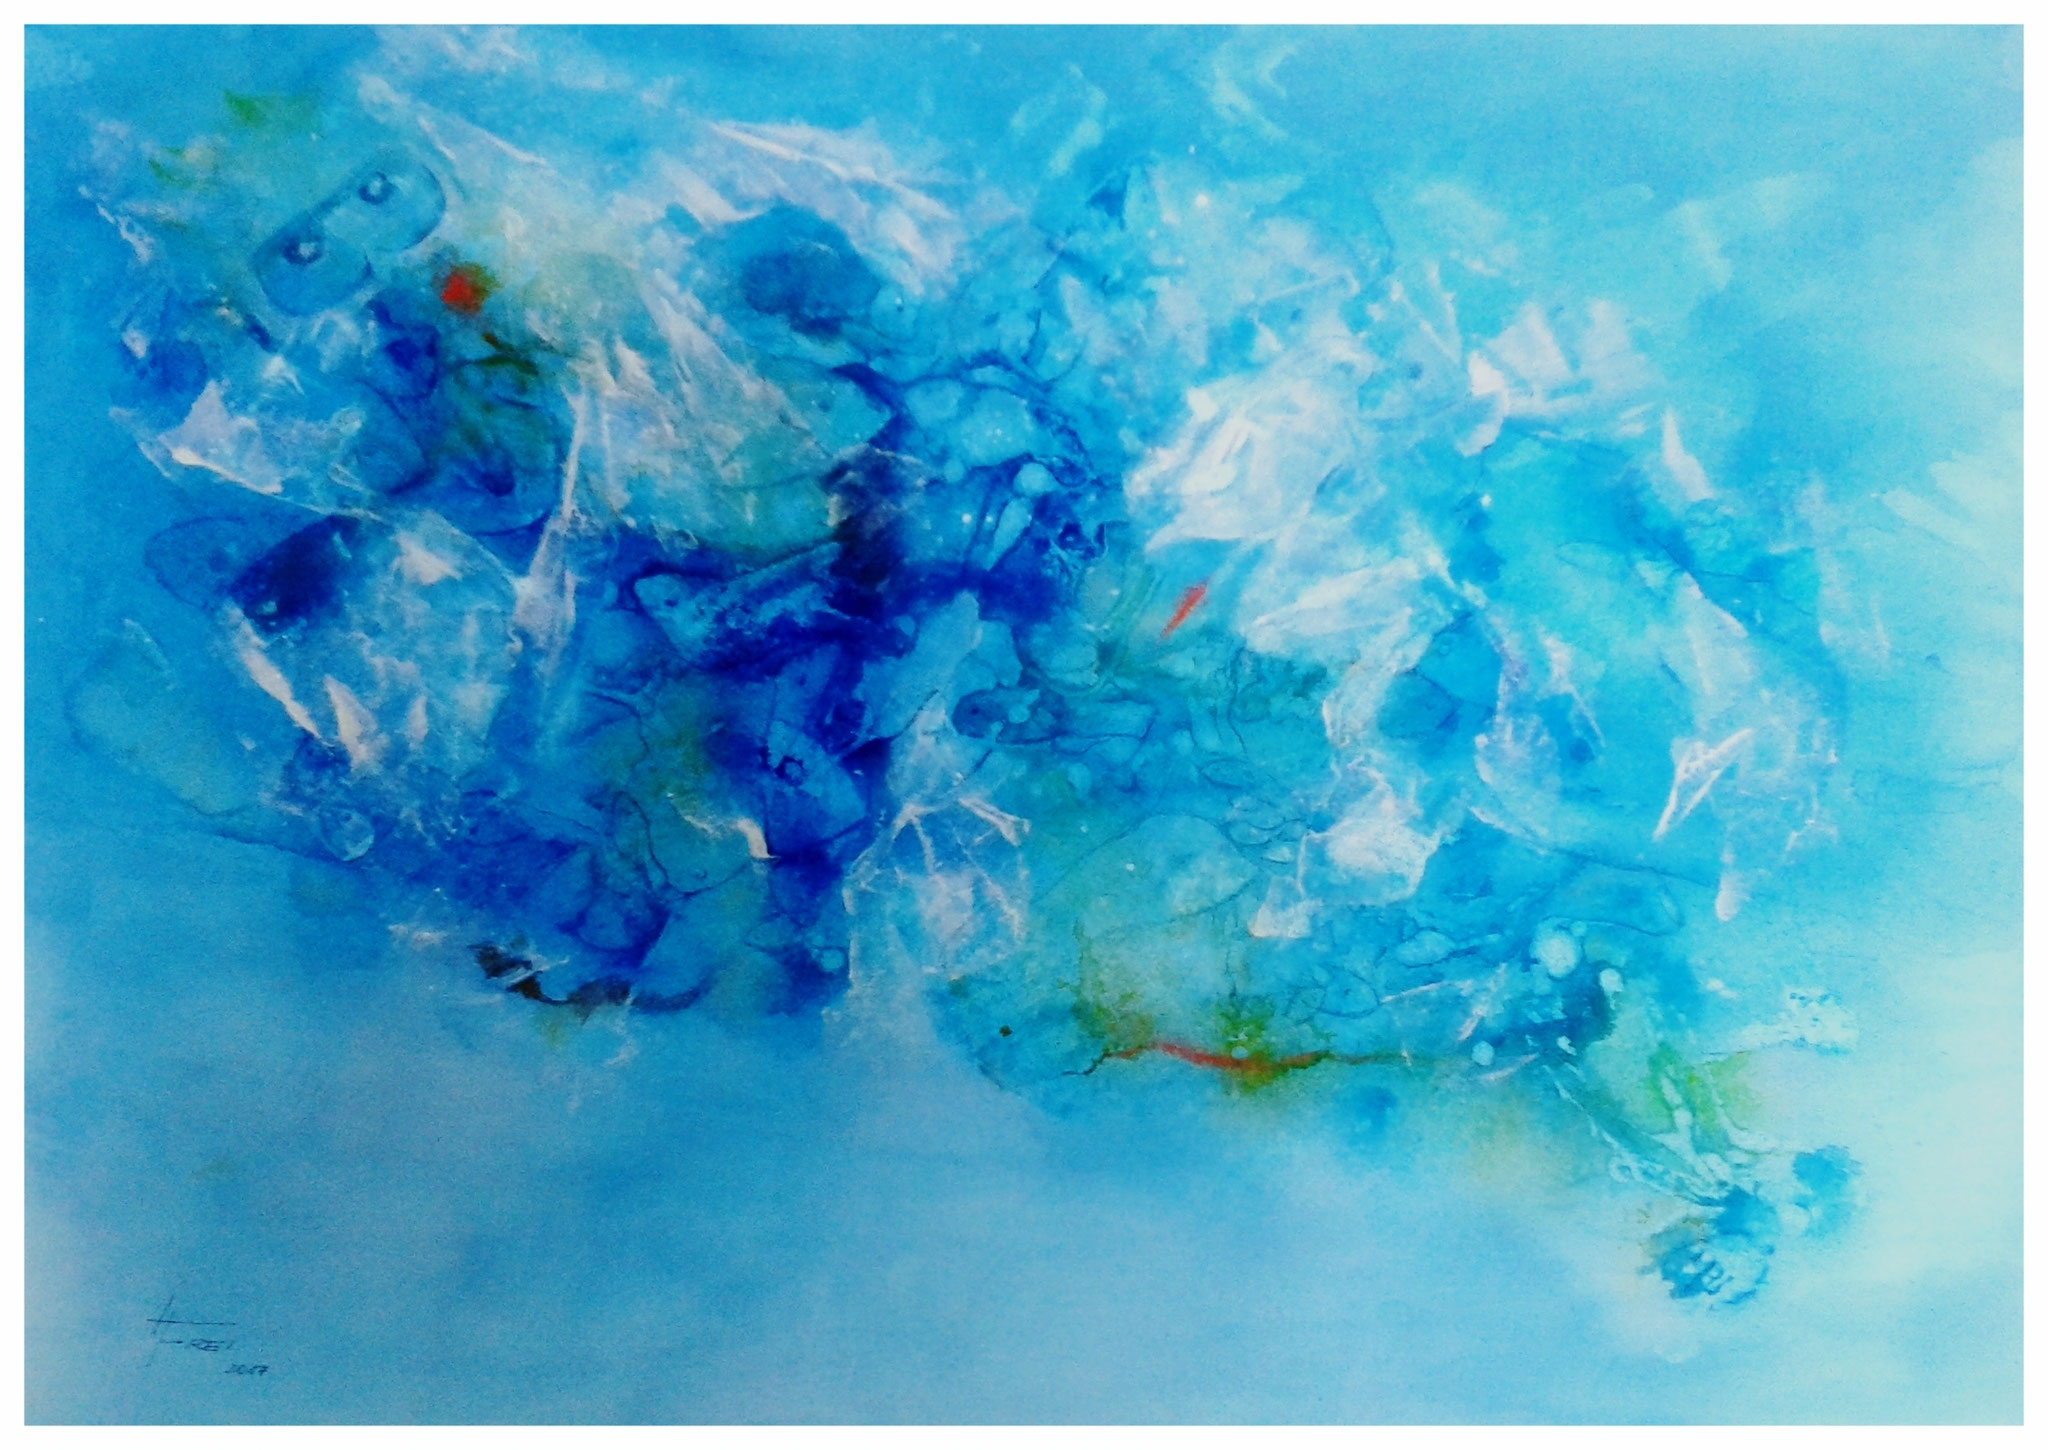 ART HFrei - Plastik im Meer